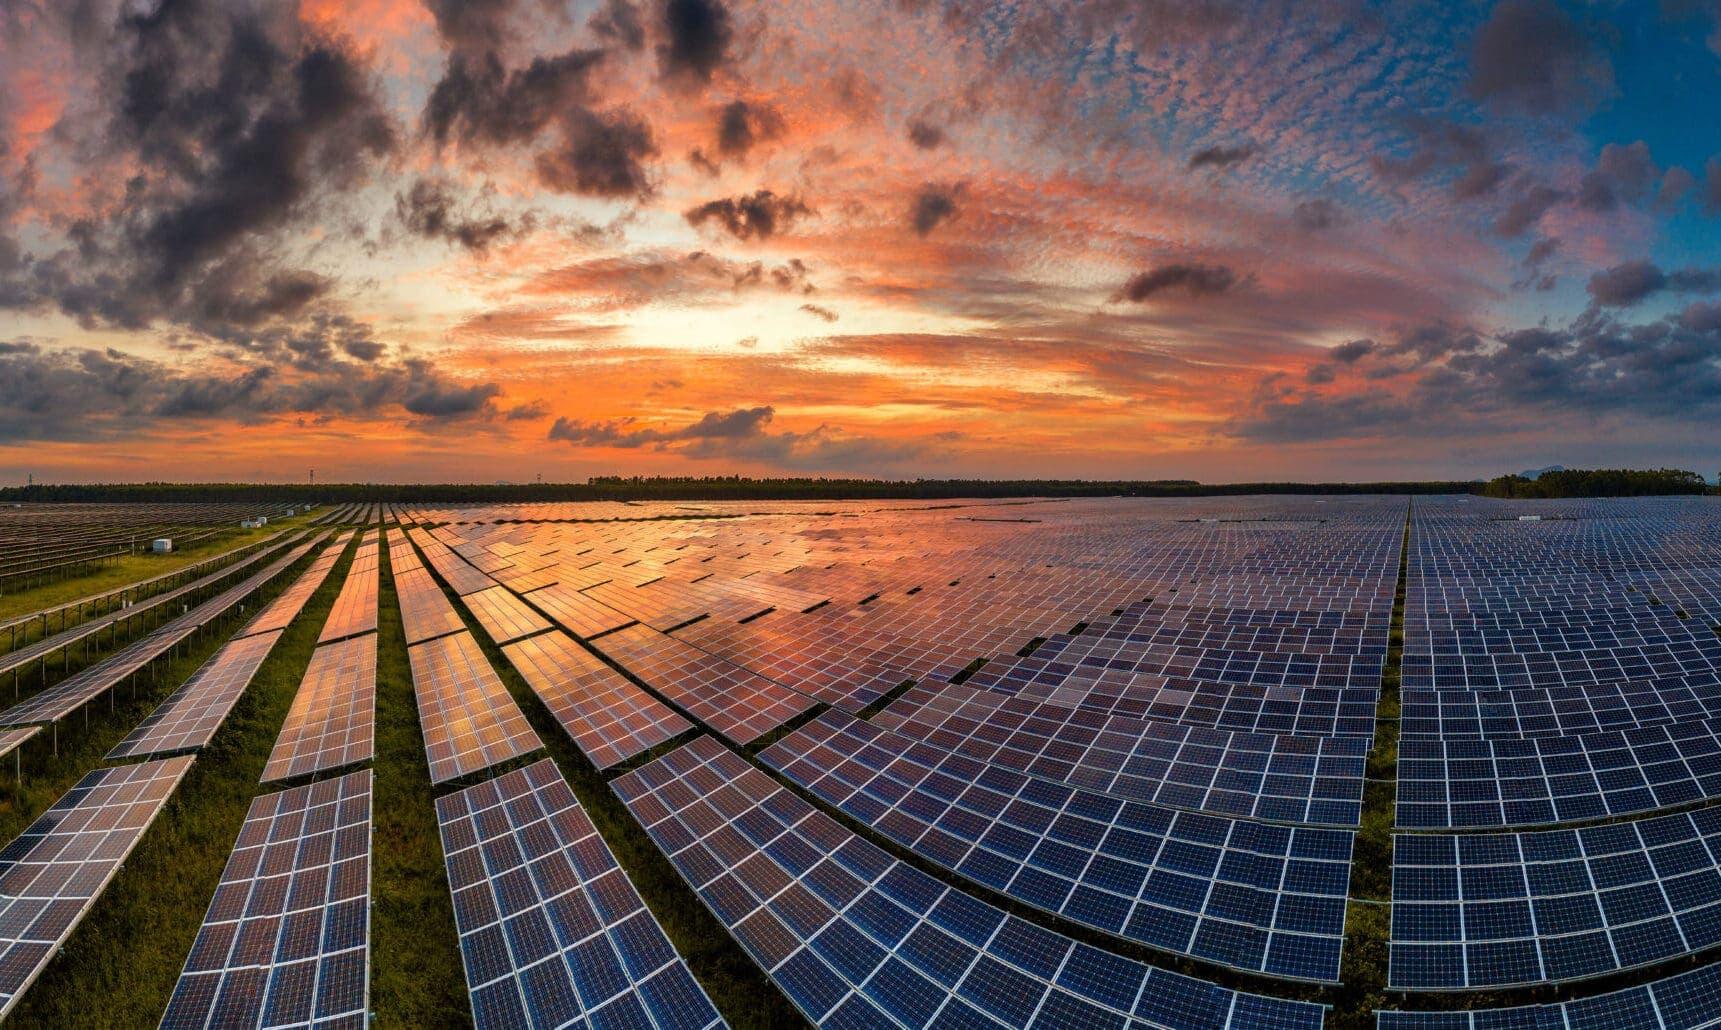 Solar Panels aka Photovoltaic Modules